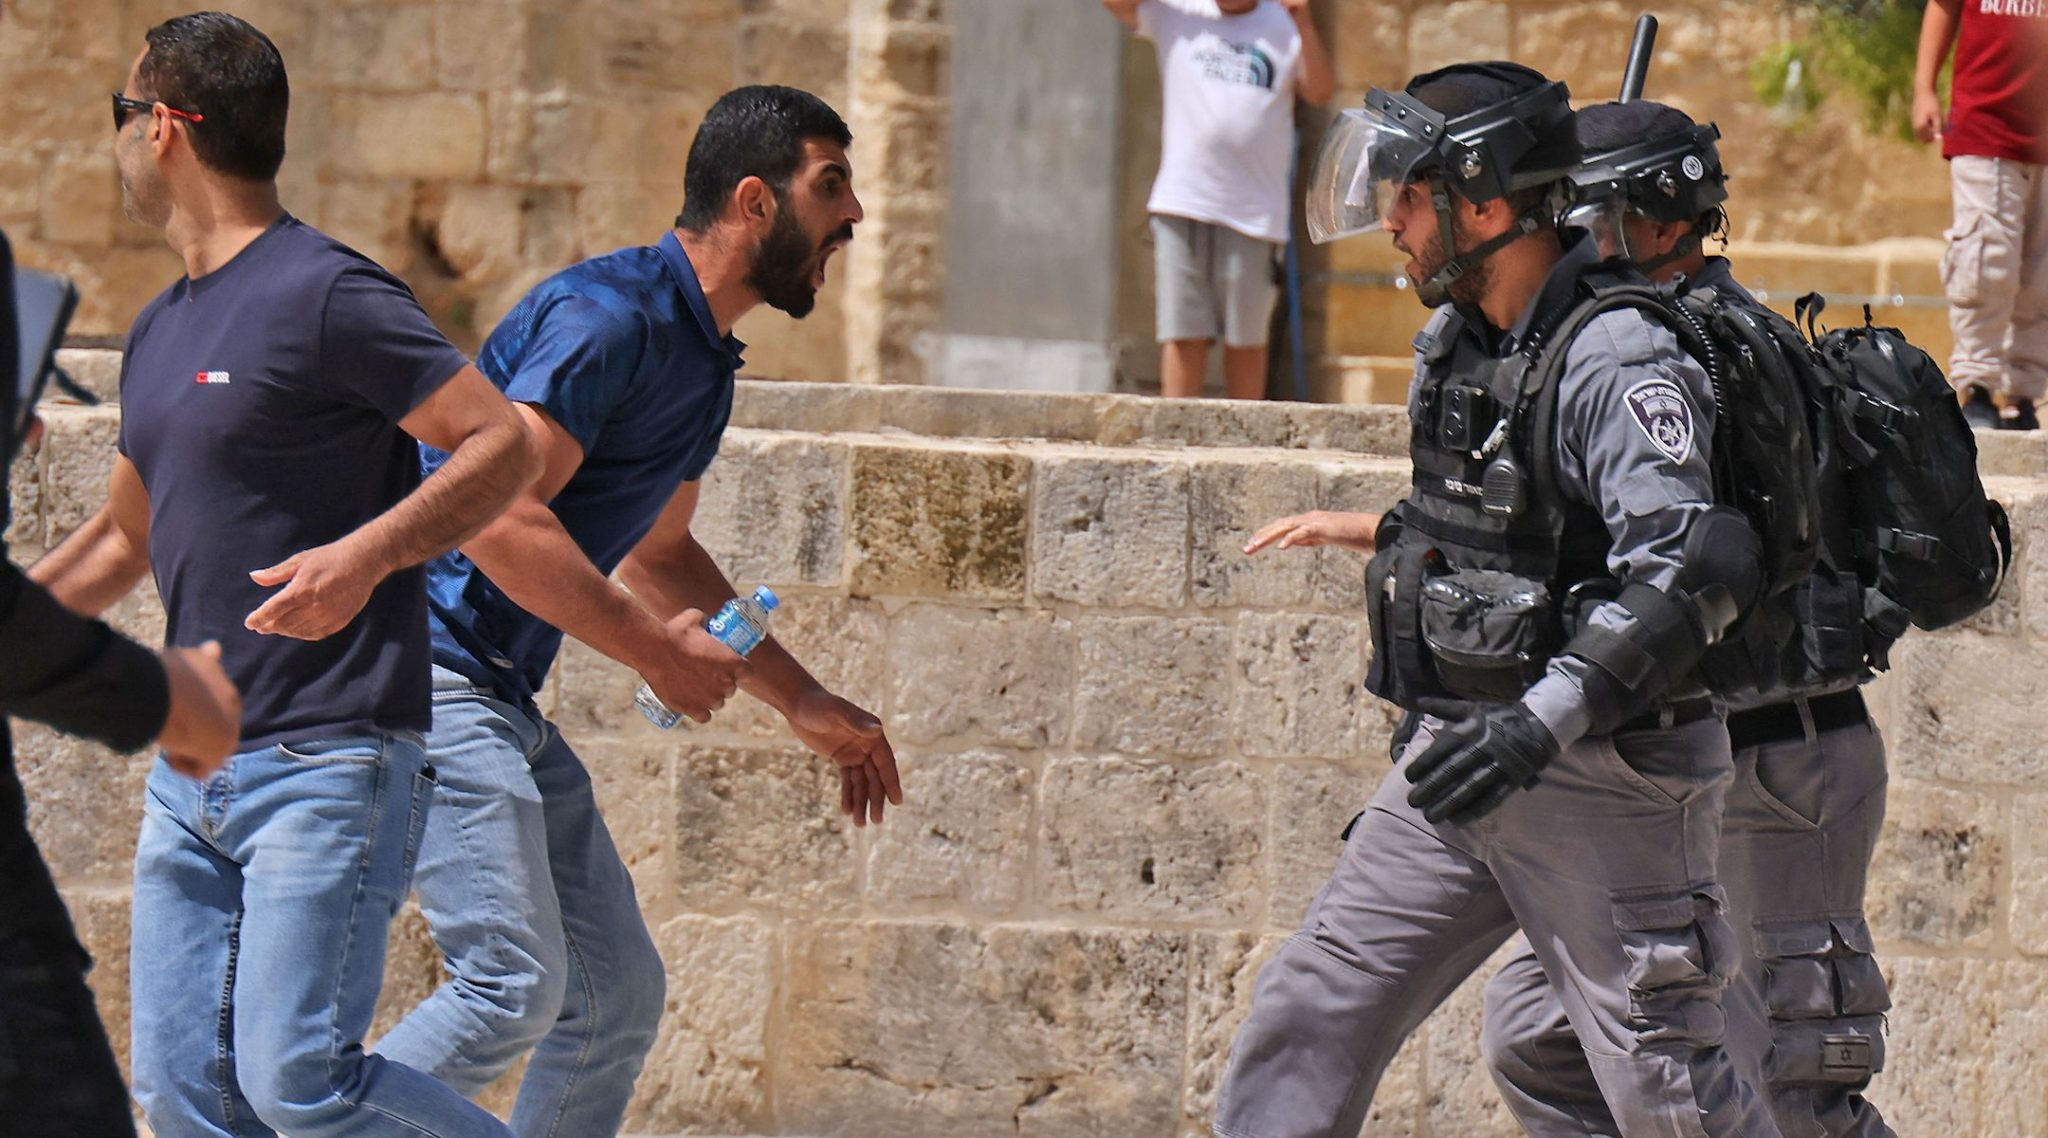 Israeli police and Palestinian Muslim worshippers clash at Jerusalem's Al-Aqsa Mosque, May 21, 2021. (Photo/JTA-Ahmad Gharabli-AFP via Getty Images)